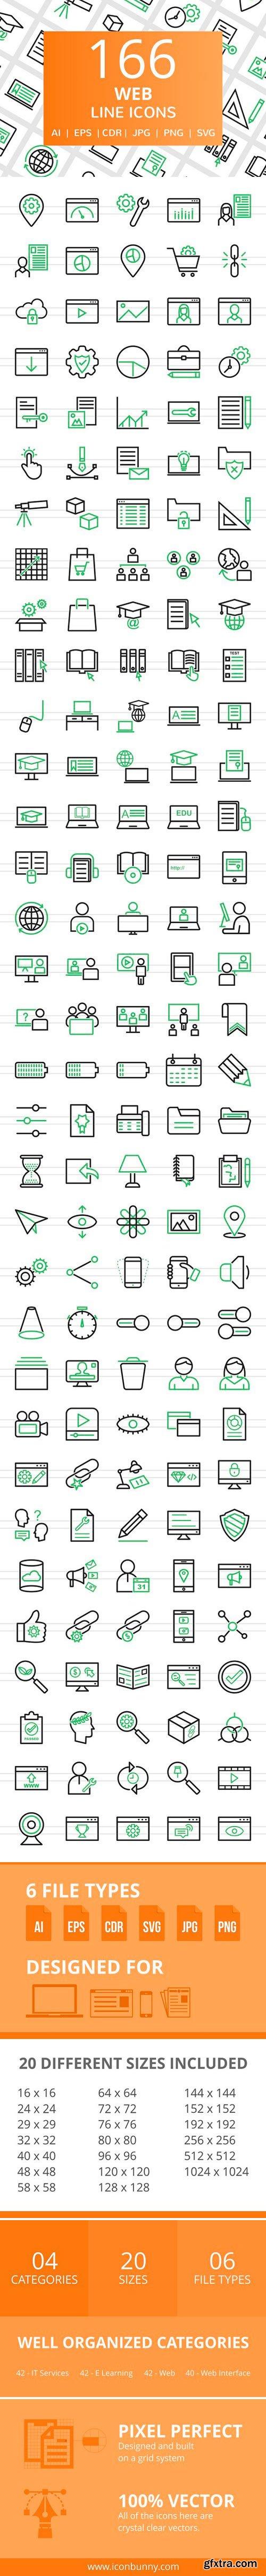 CM - 166 Web Line Icons 2456739